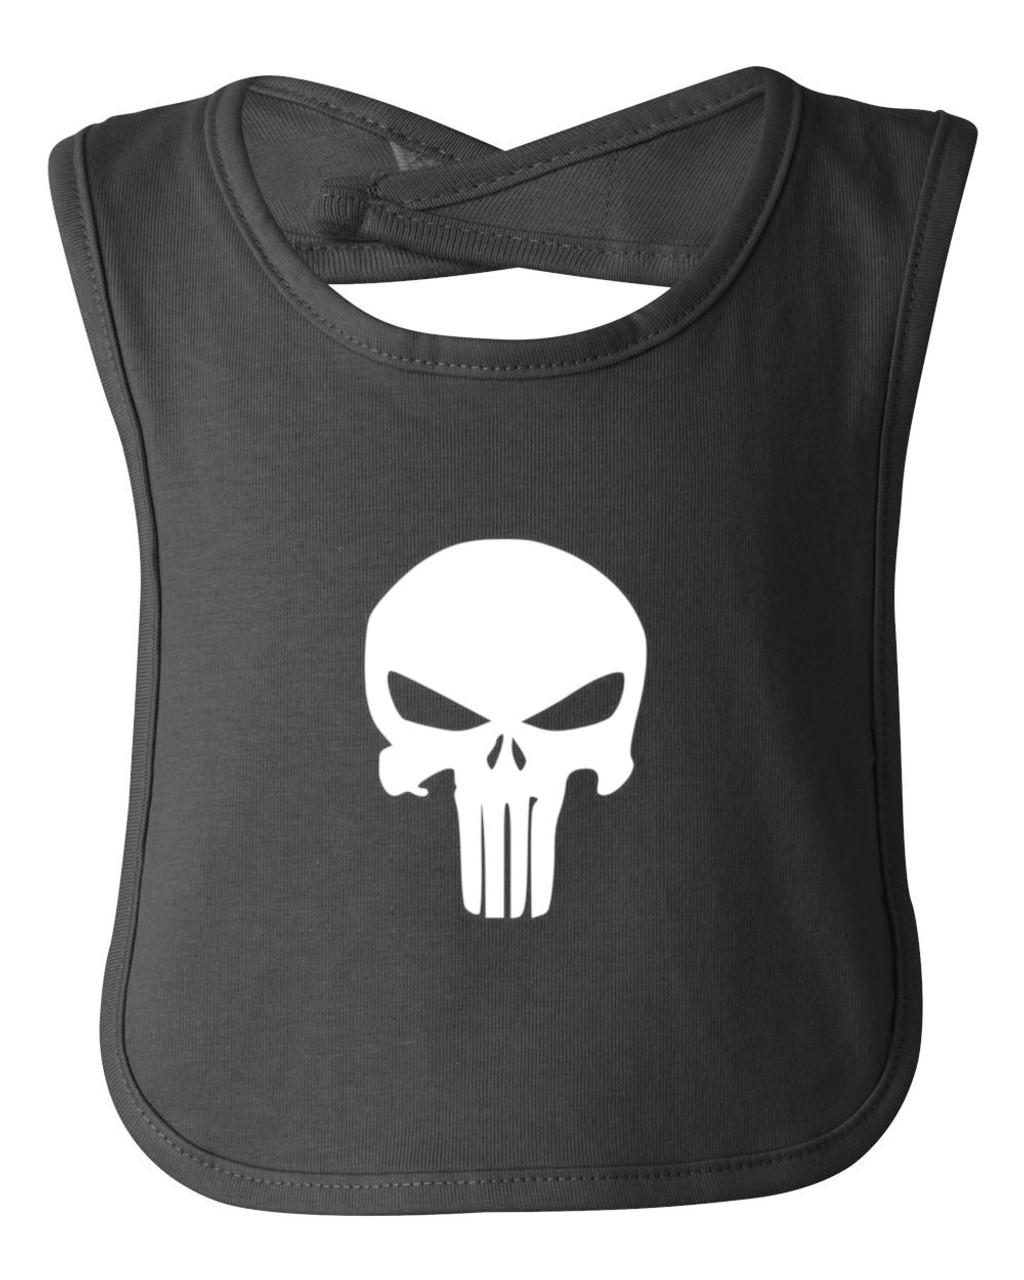 Skull Punisher Logo Baby Bib Cotton Apron Child Smock